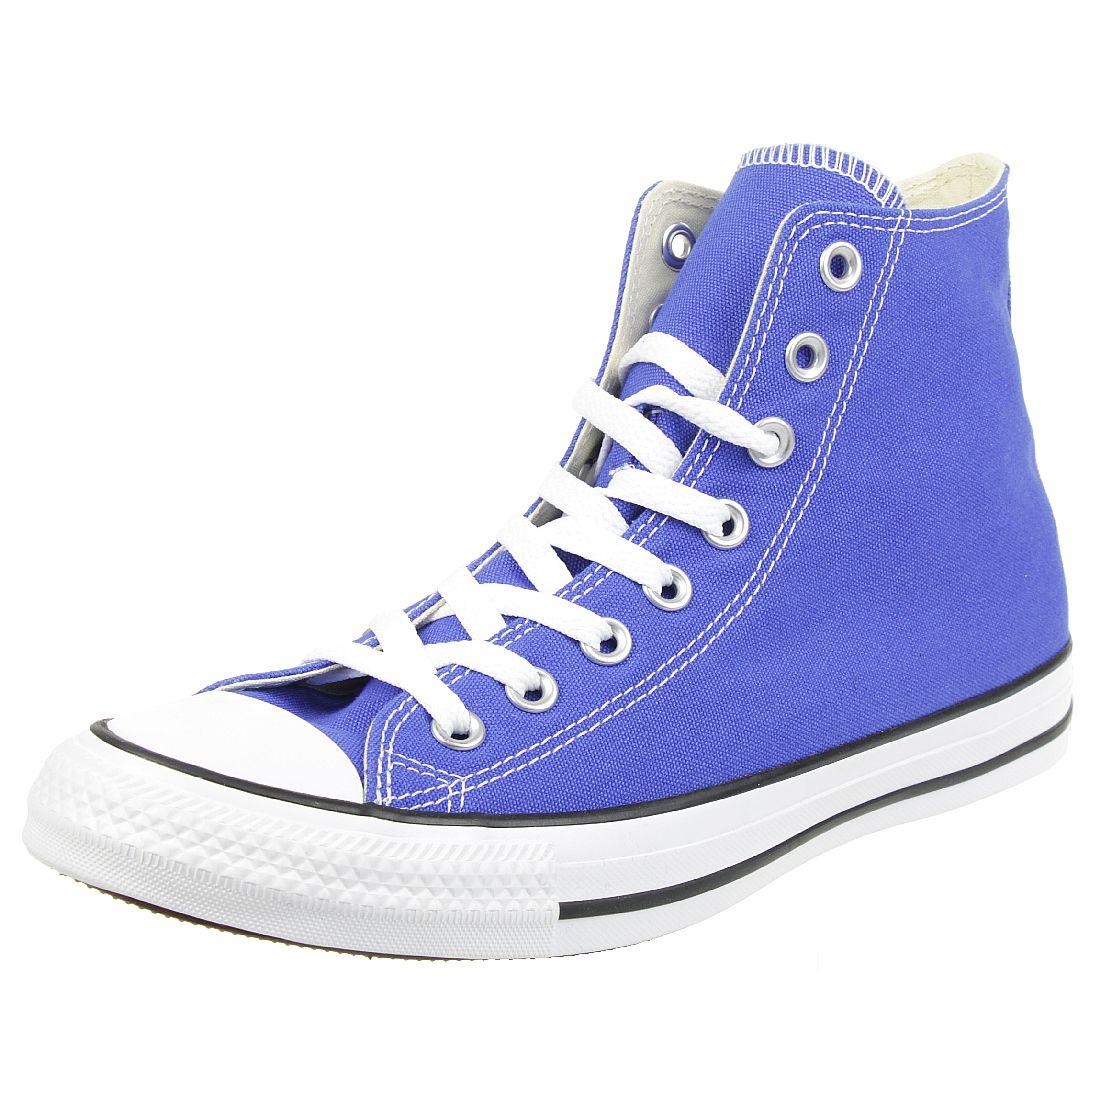 premium selection da9d6 c08a0 Converse C Taylor All Star HI Chuck Schuhe Sneaker canvas ...